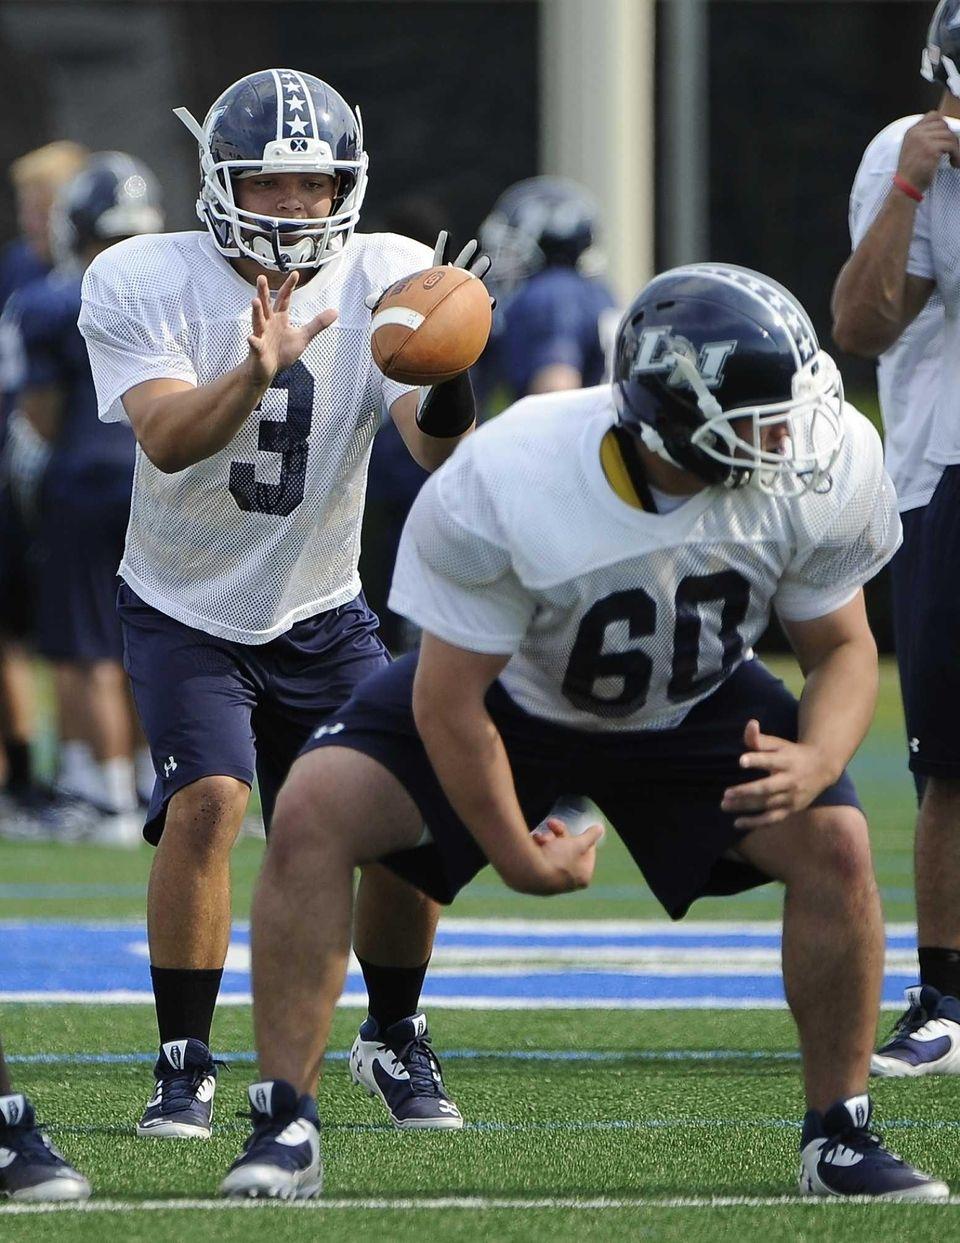 Long Island quarterback AJ Otranto receives a snap